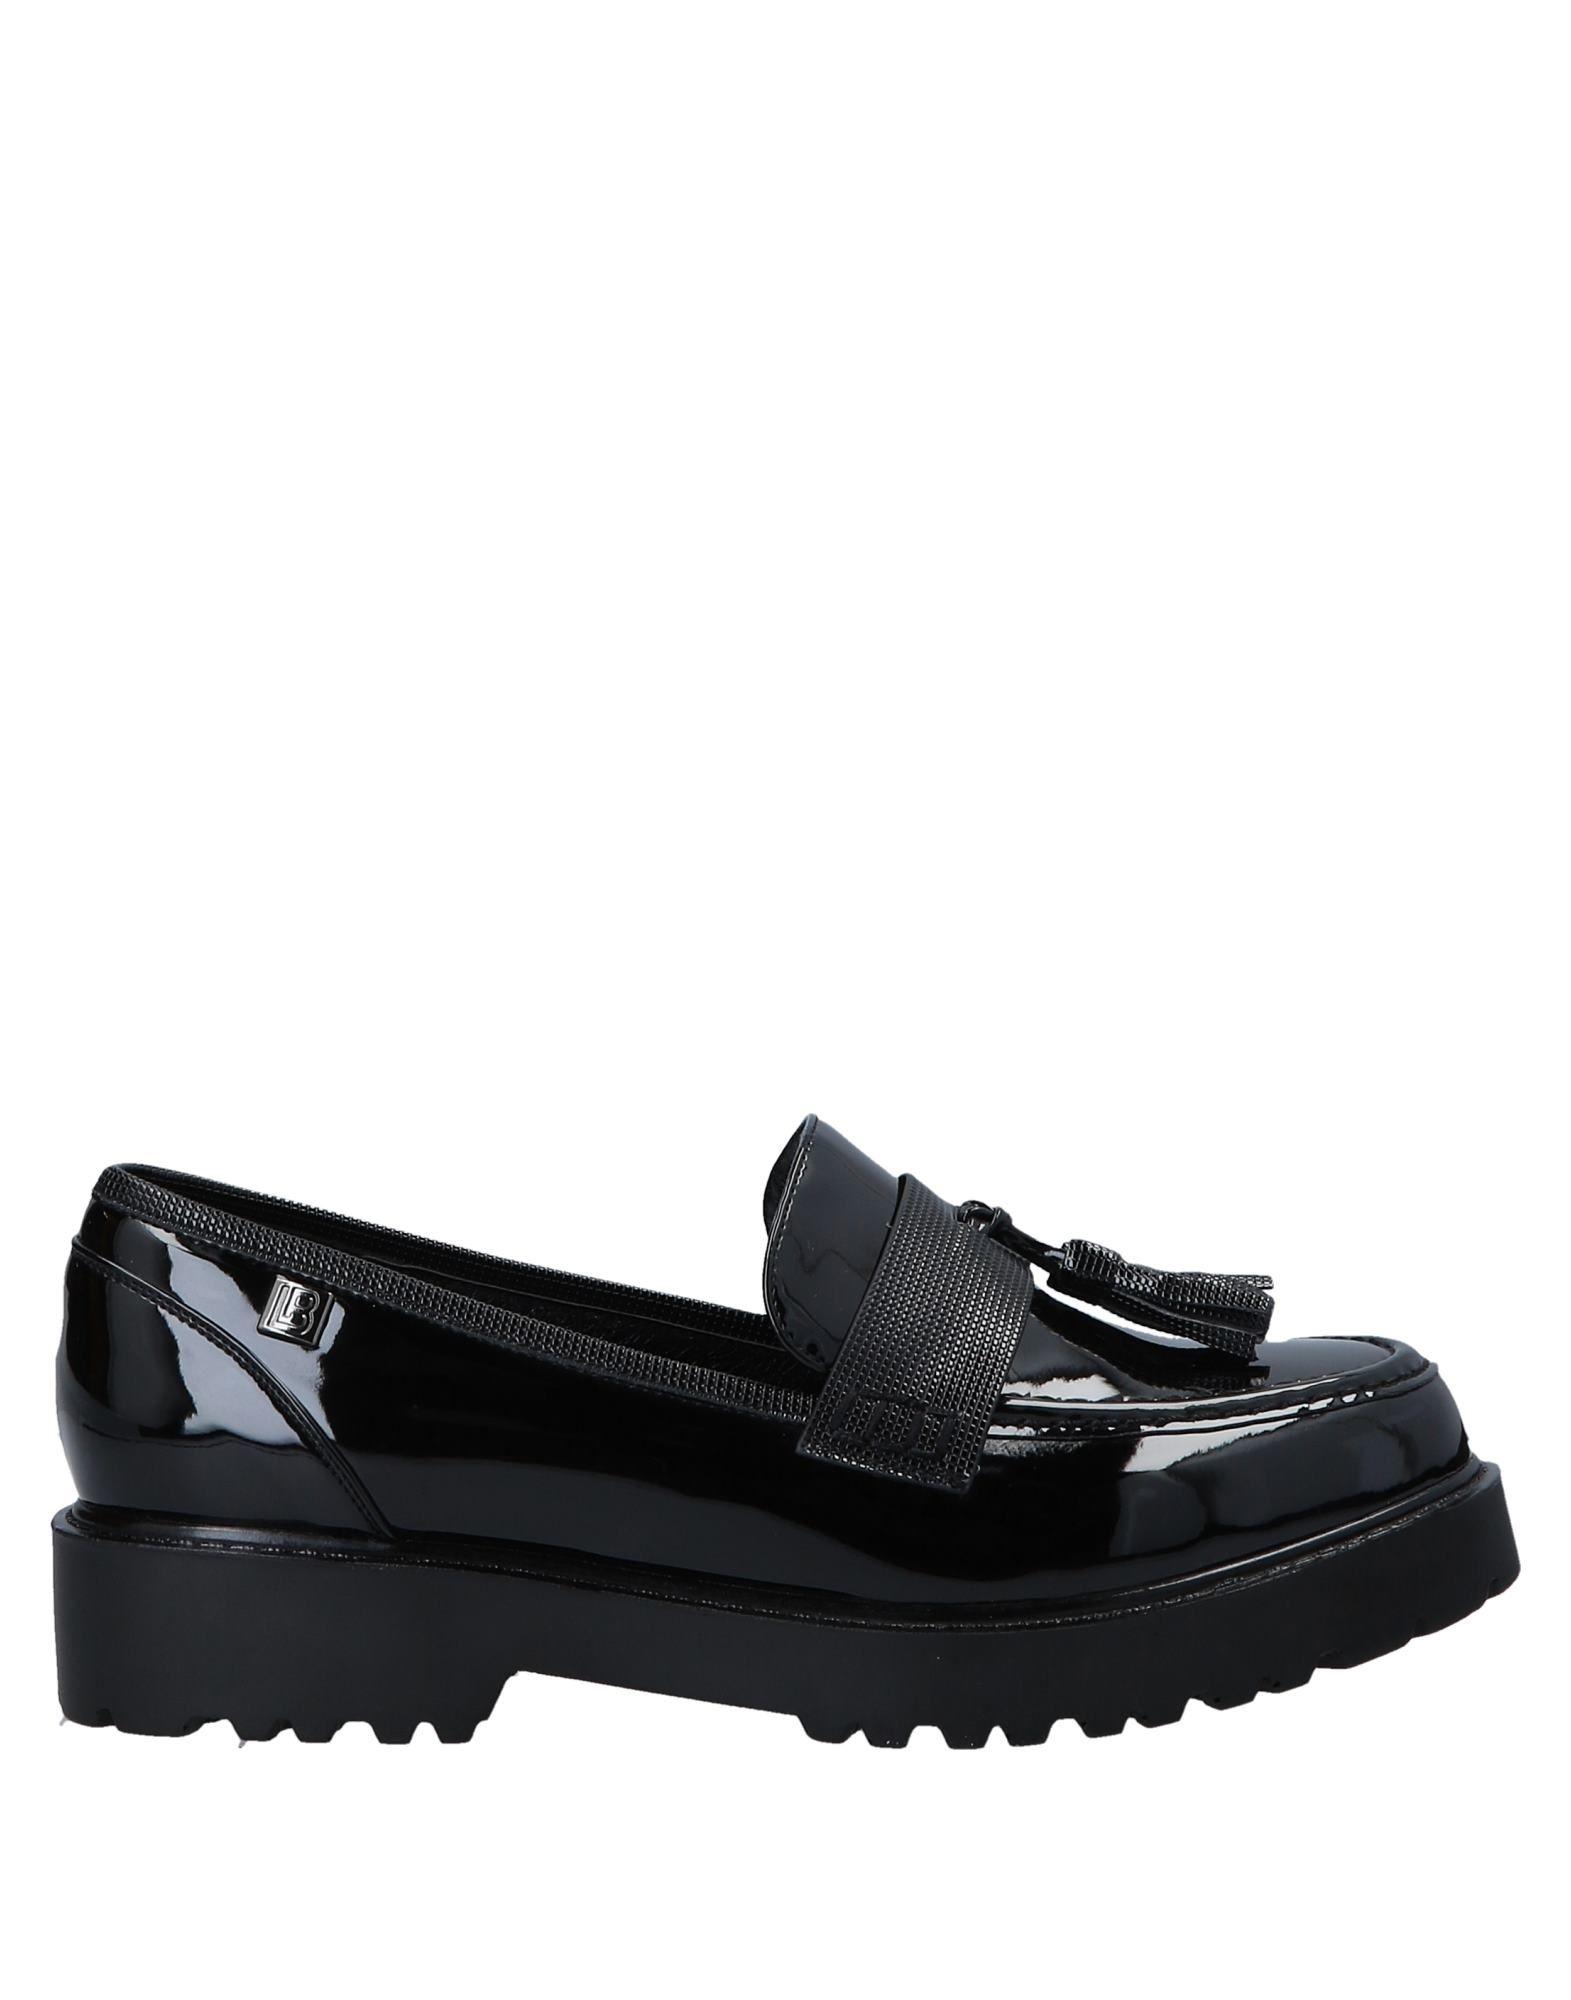 Laura Biagiotti Mokassins Damen  11546888JD Gute Qualität beliebte Schuhe